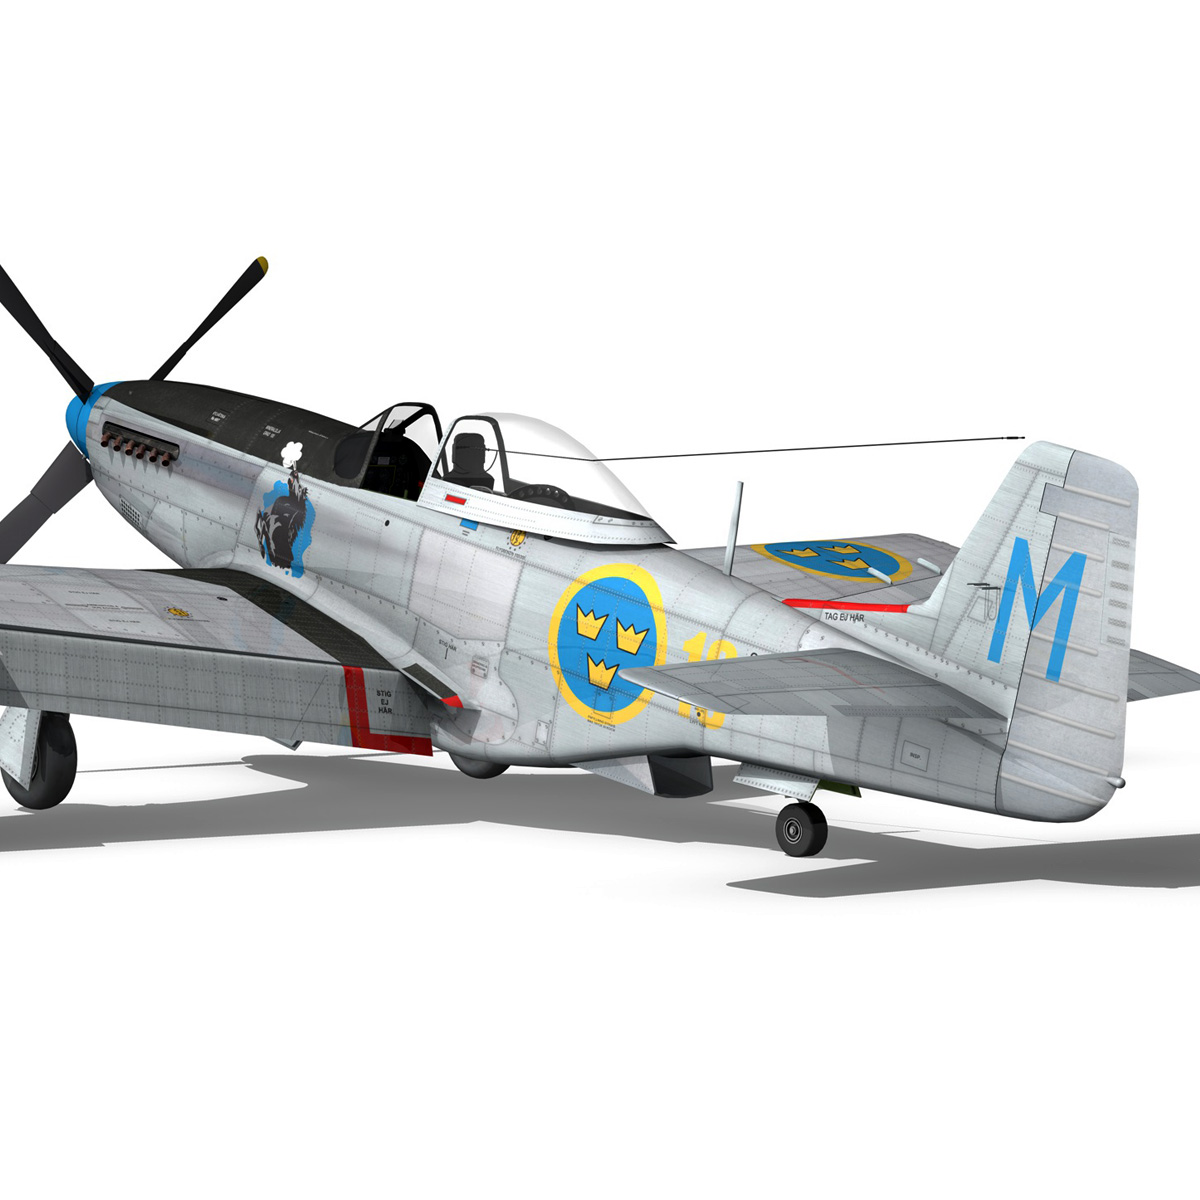 north american p-51d mustang – swedisch airforce 3d model fbx c4d lwo obj 268238